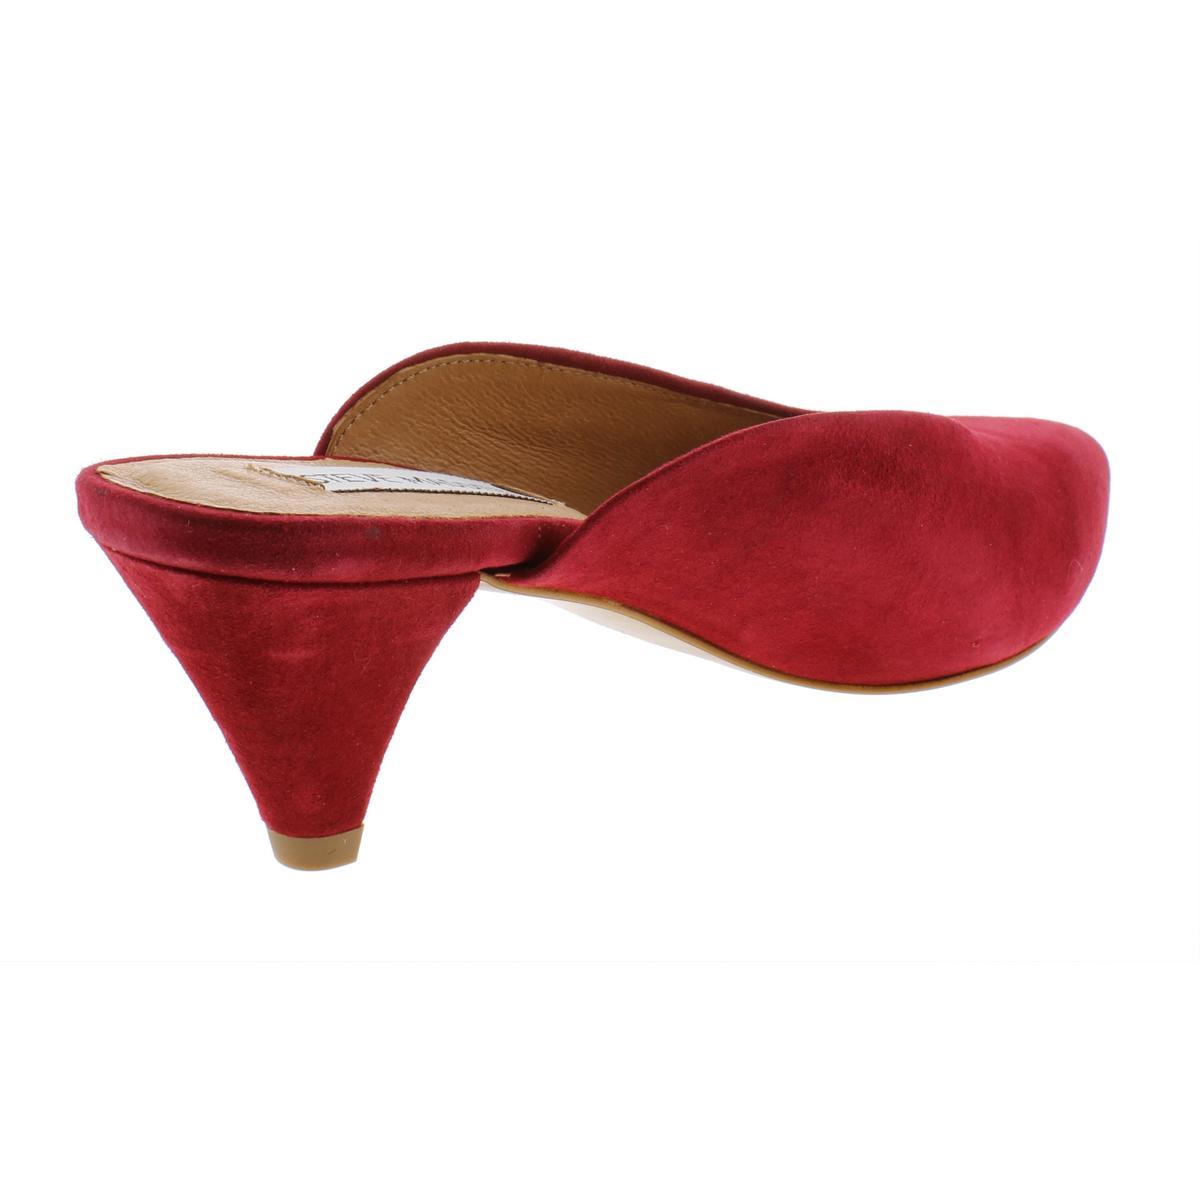 Steve-Madden-Womens-Fiesta-Leather-Pointed-Toe-Dress-Mules-Heels-BHFO-0632 thumbnail 8